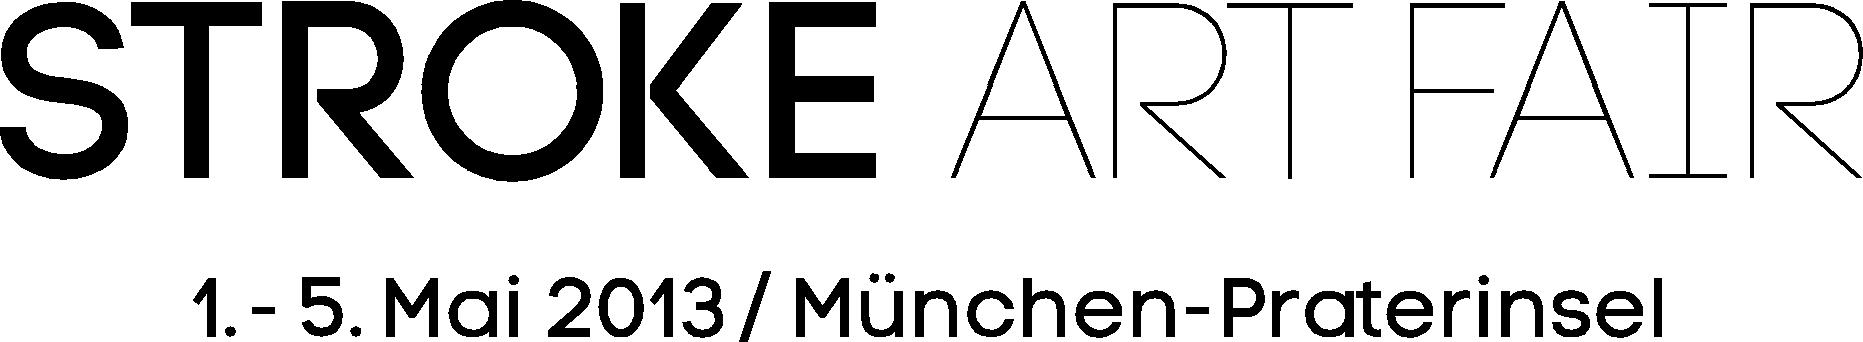 STROKE_logo_positiv